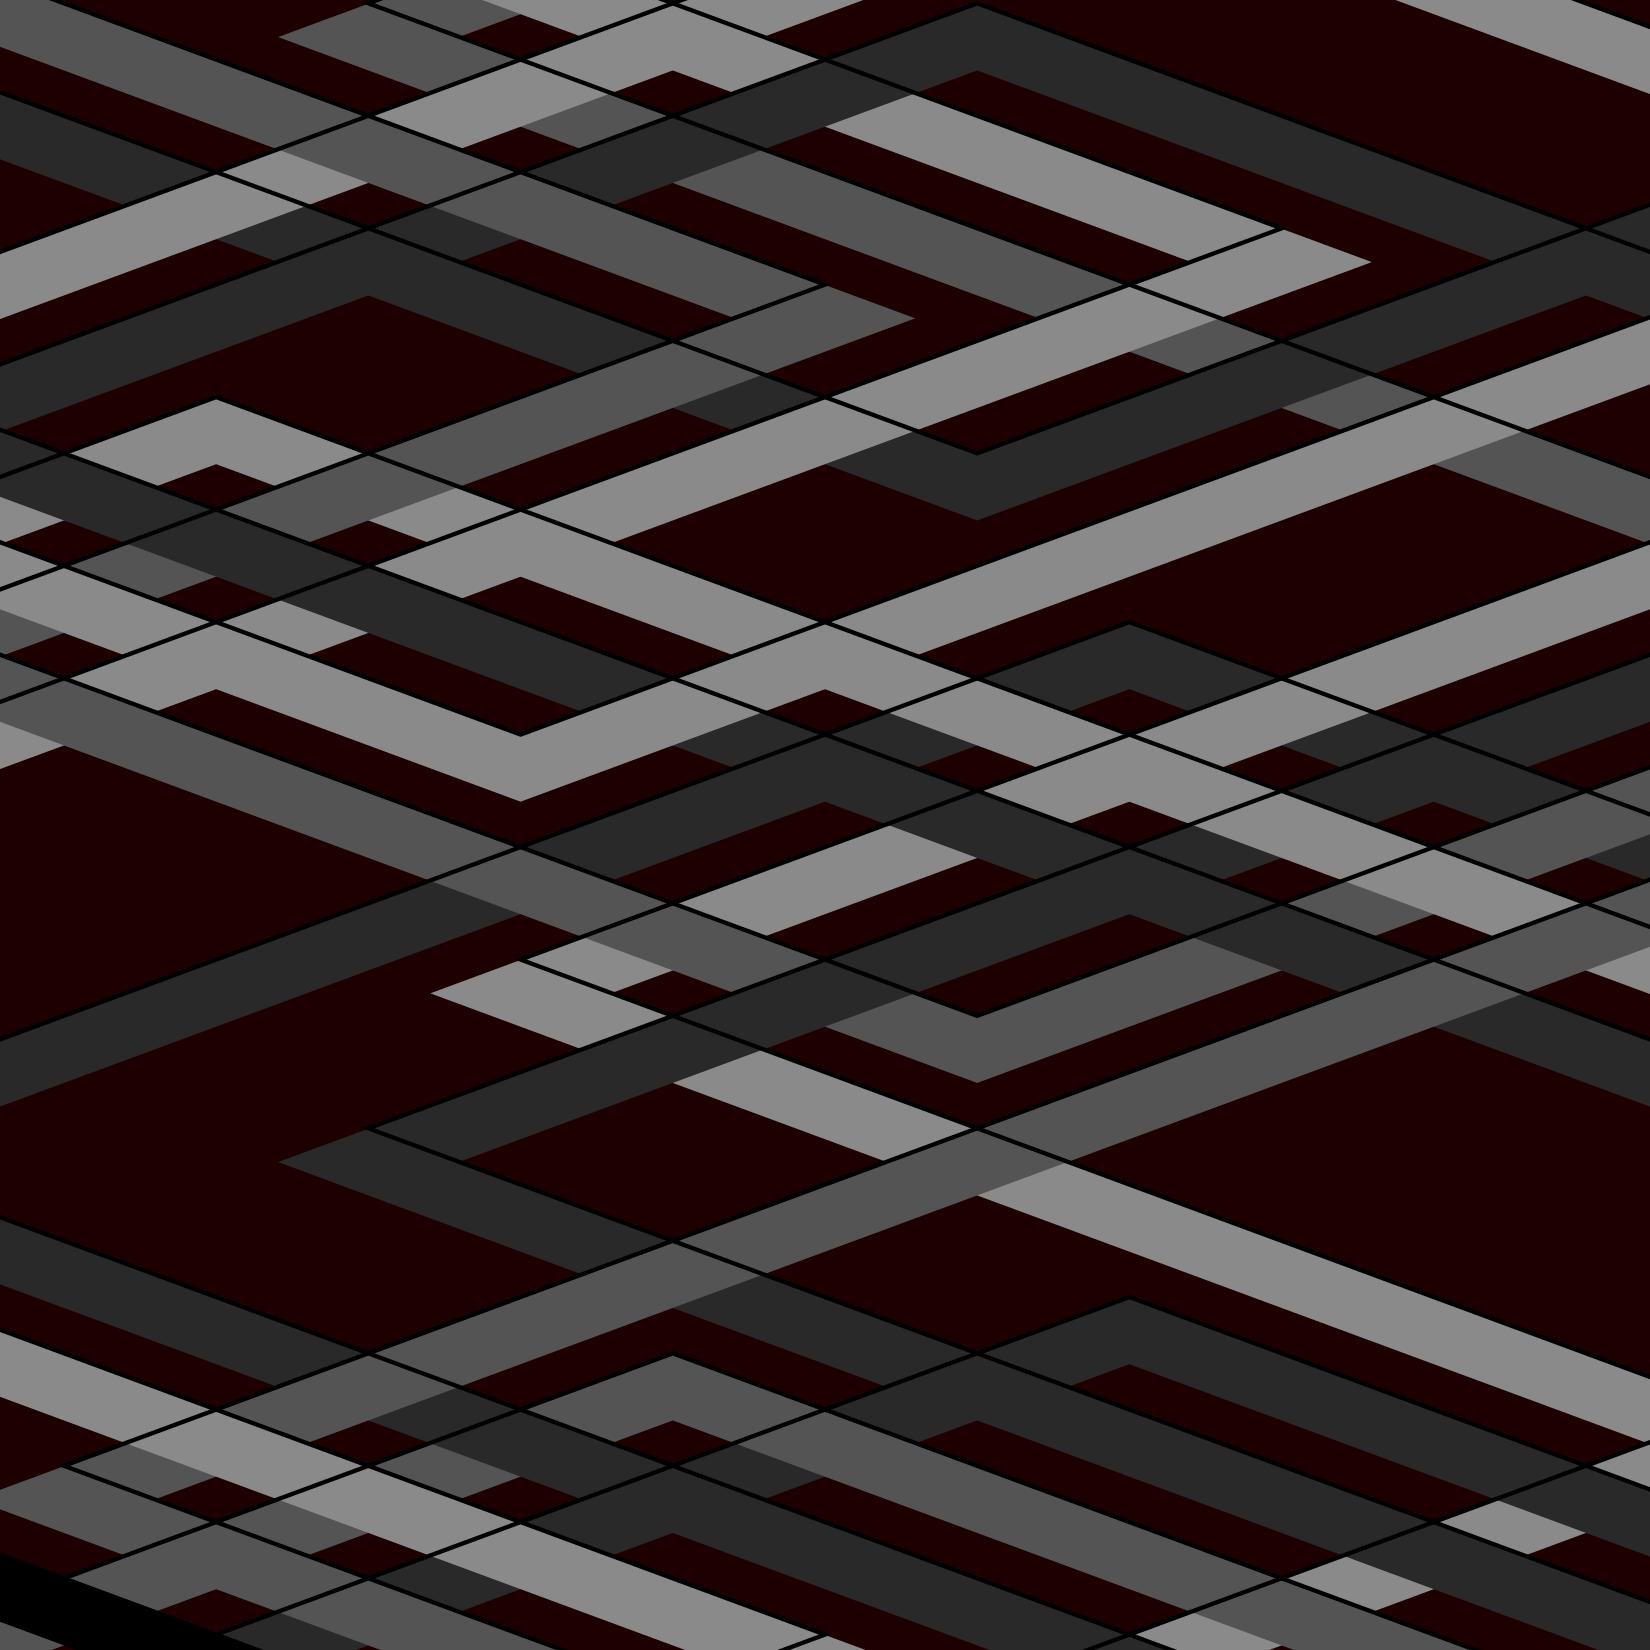 Converging Arrows-01.png